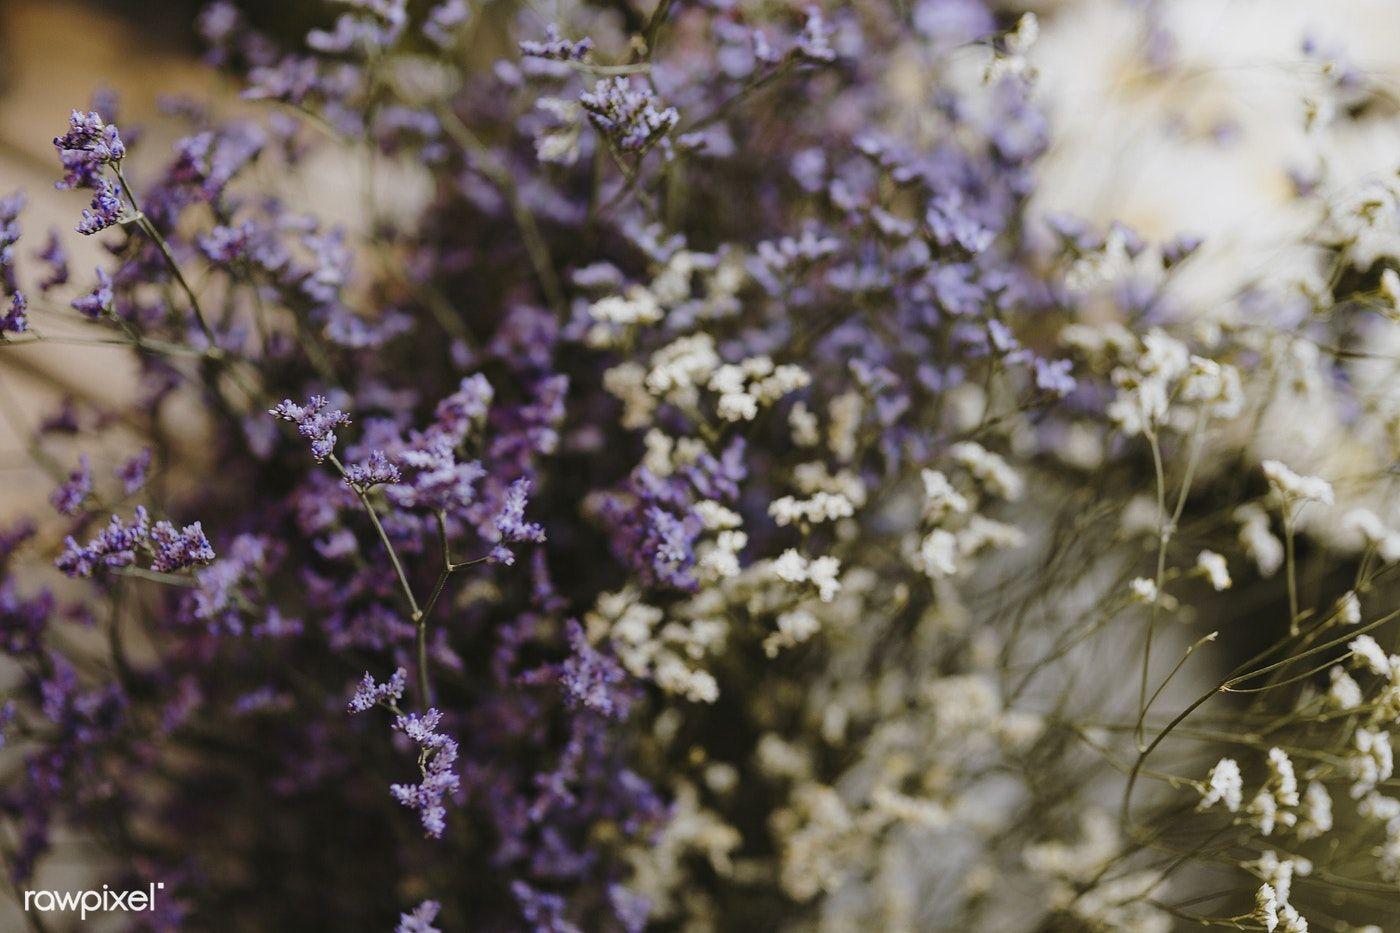 Closeup Of White And Purple Caspia Flowers Free Image By Rawpixel Com Karolina Kaboompics